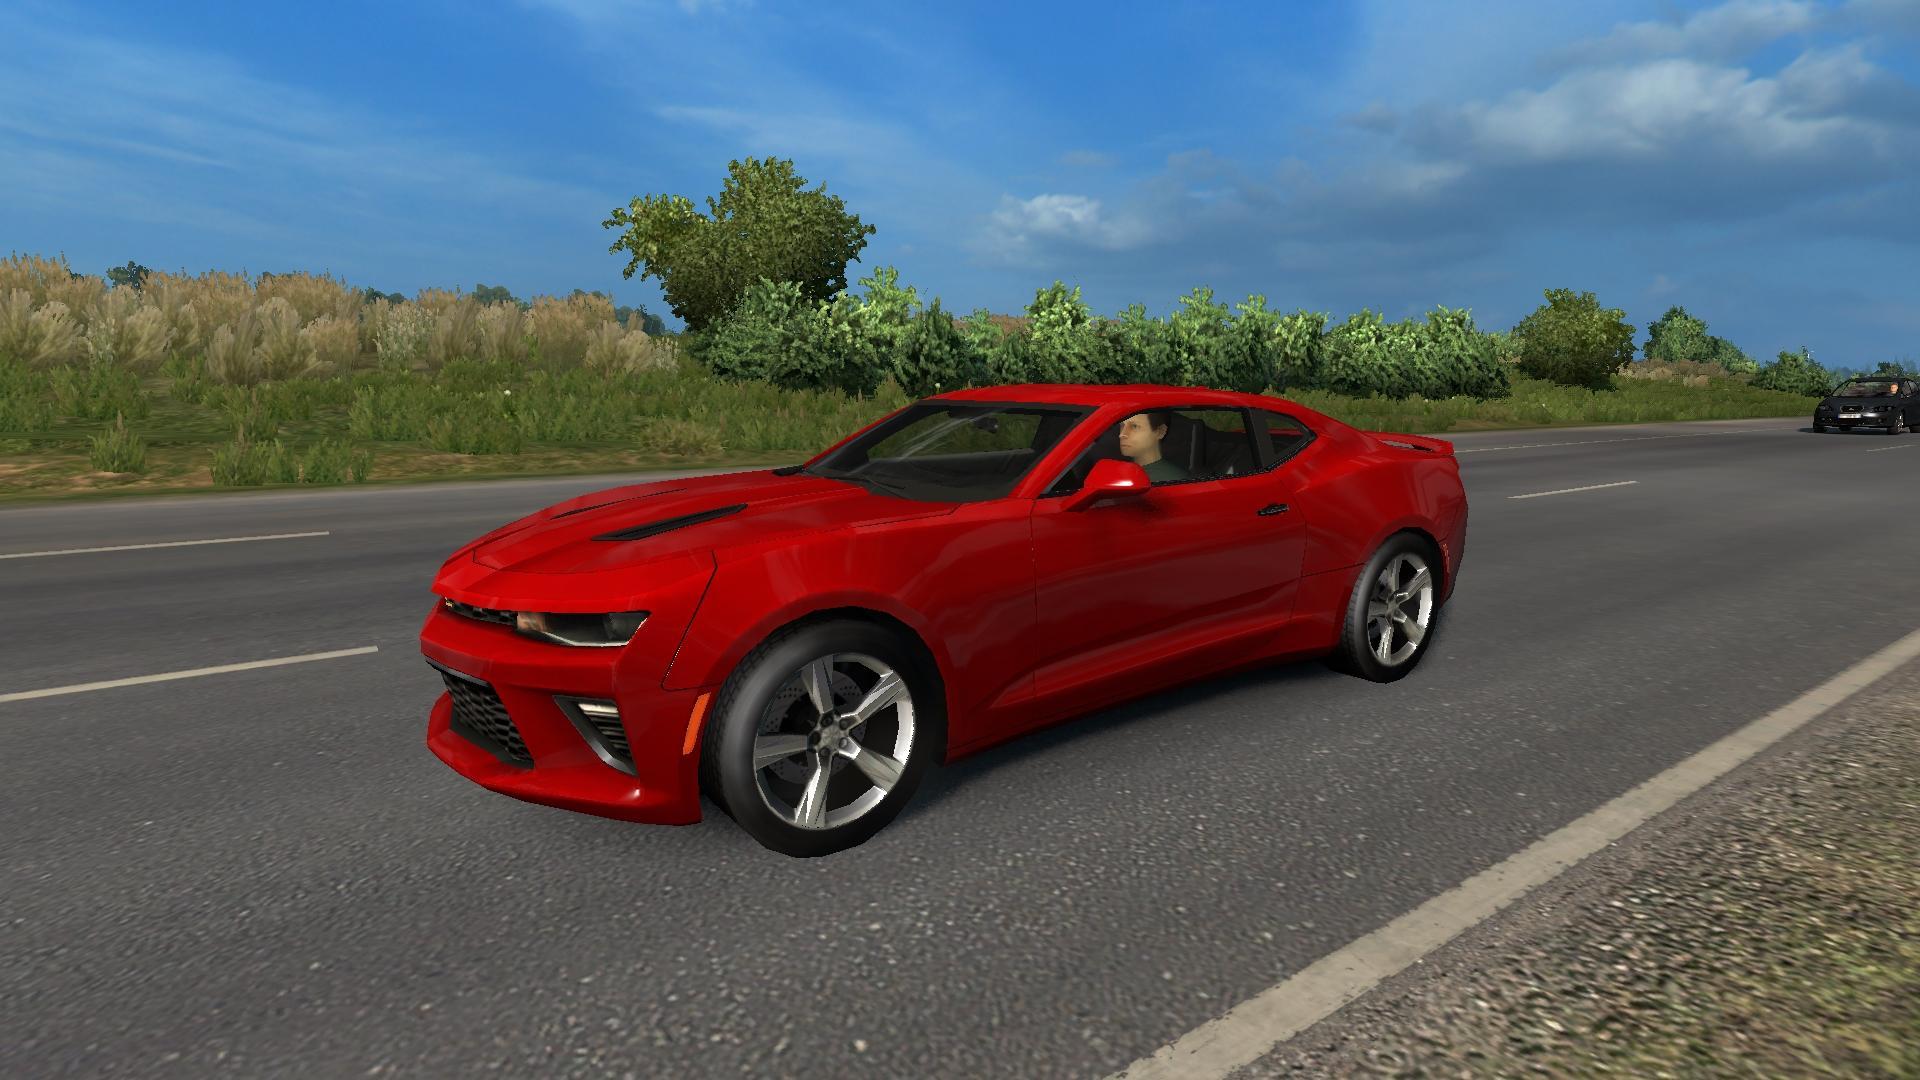 AI TRAFFIC CARS FROM ATS 1 30 MOD - ETS2 Mod